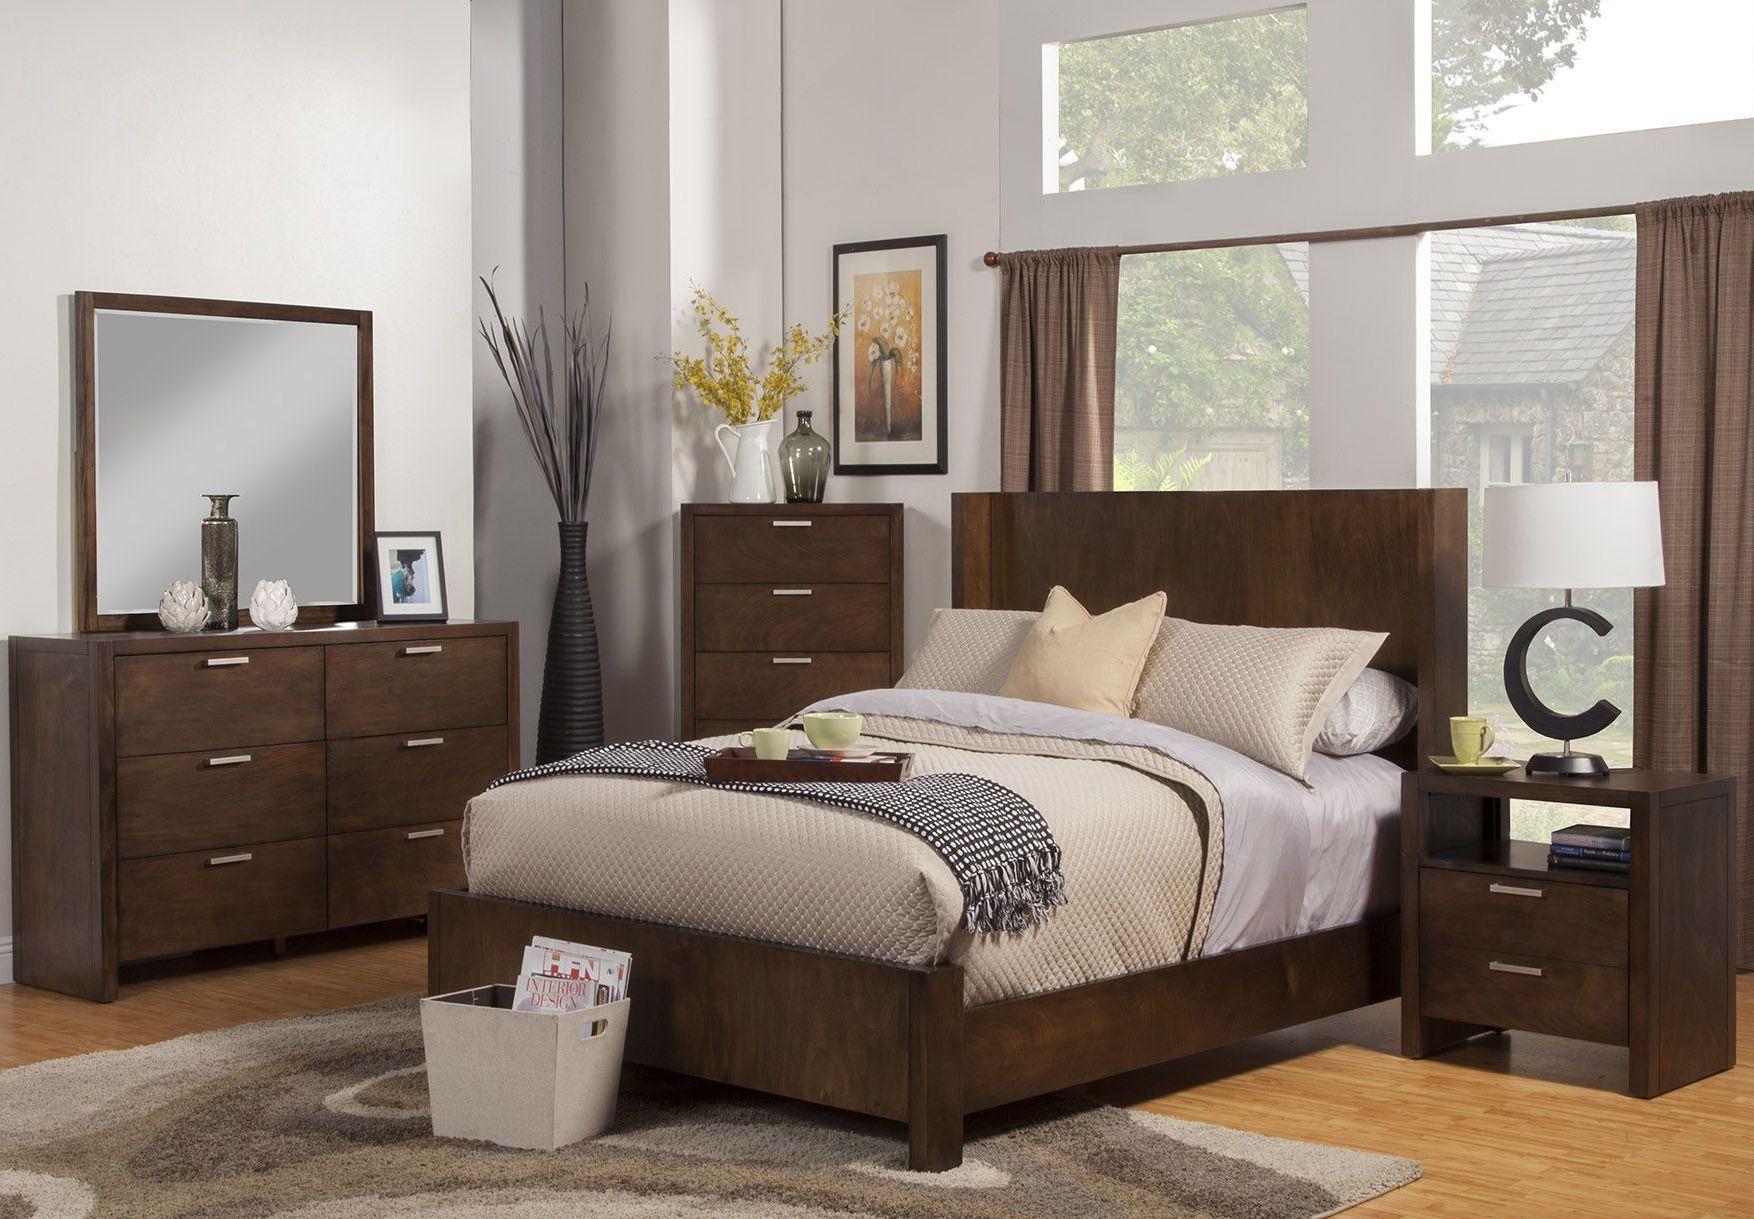 austin chestnut shelter panel bedroom set 1600 01q alpine